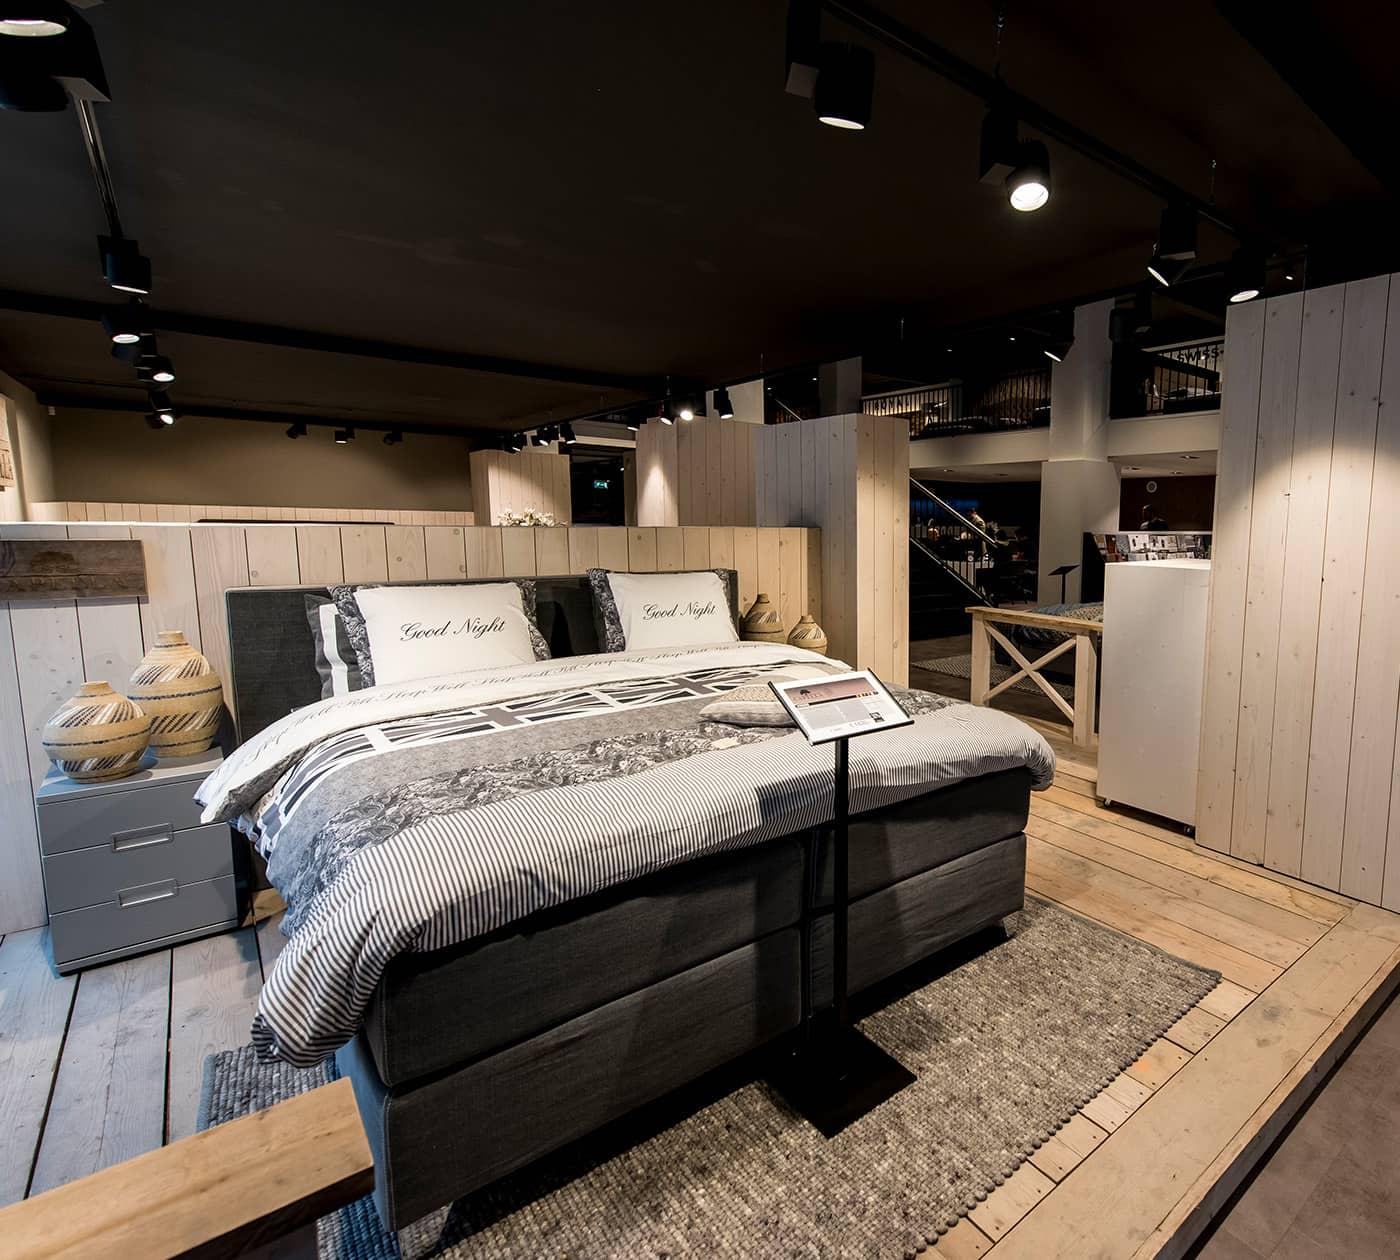 boxspringbetten saarbr cken swiss sense gro e auswahl. Black Bedroom Furniture Sets. Home Design Ideas